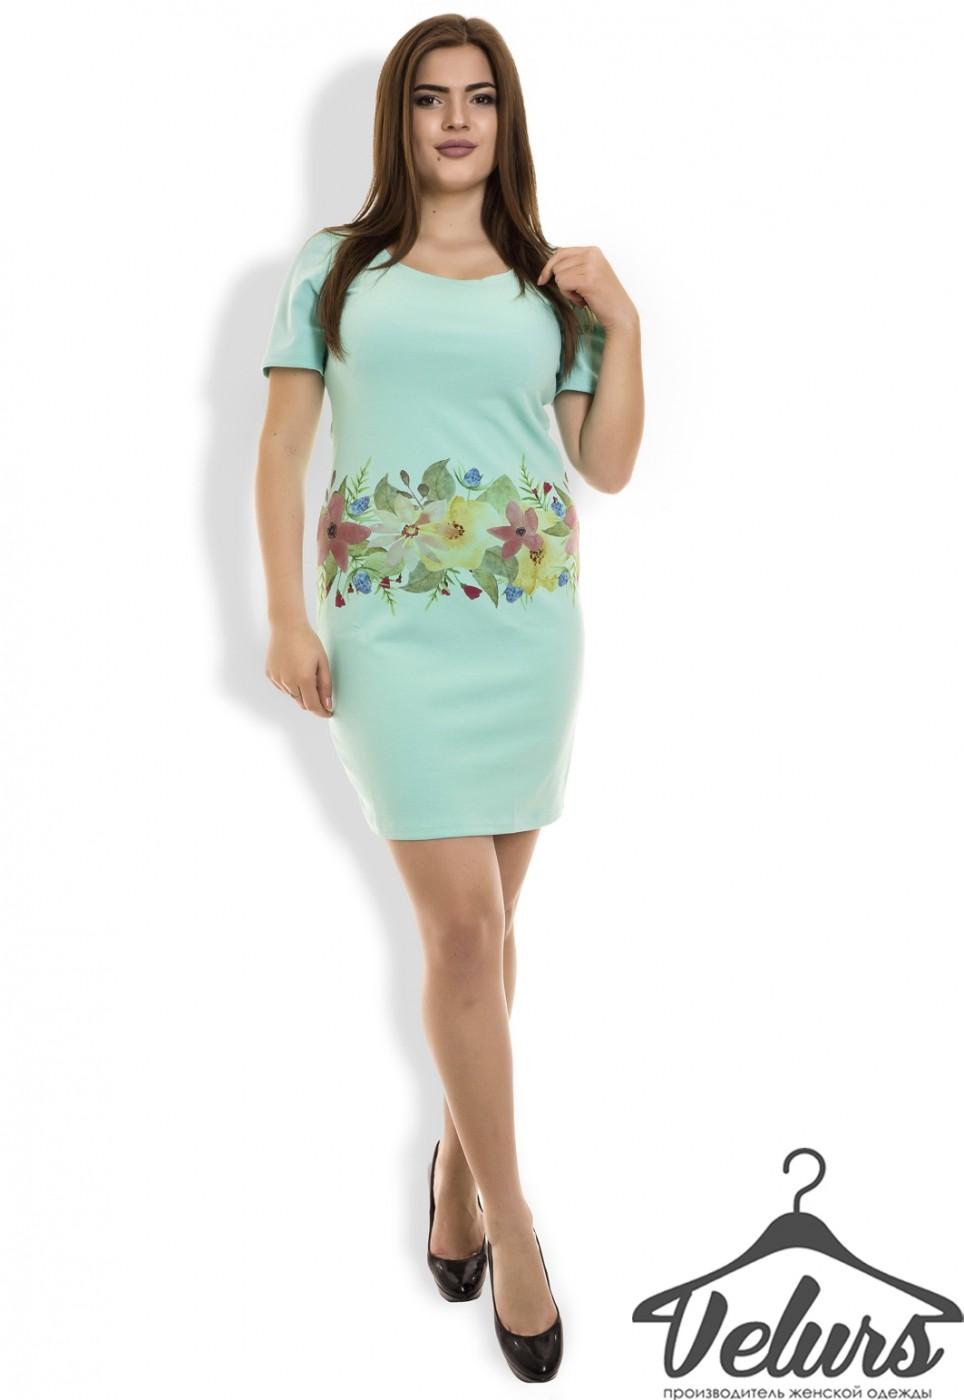 Velurs: Платье 212126 - фото 13